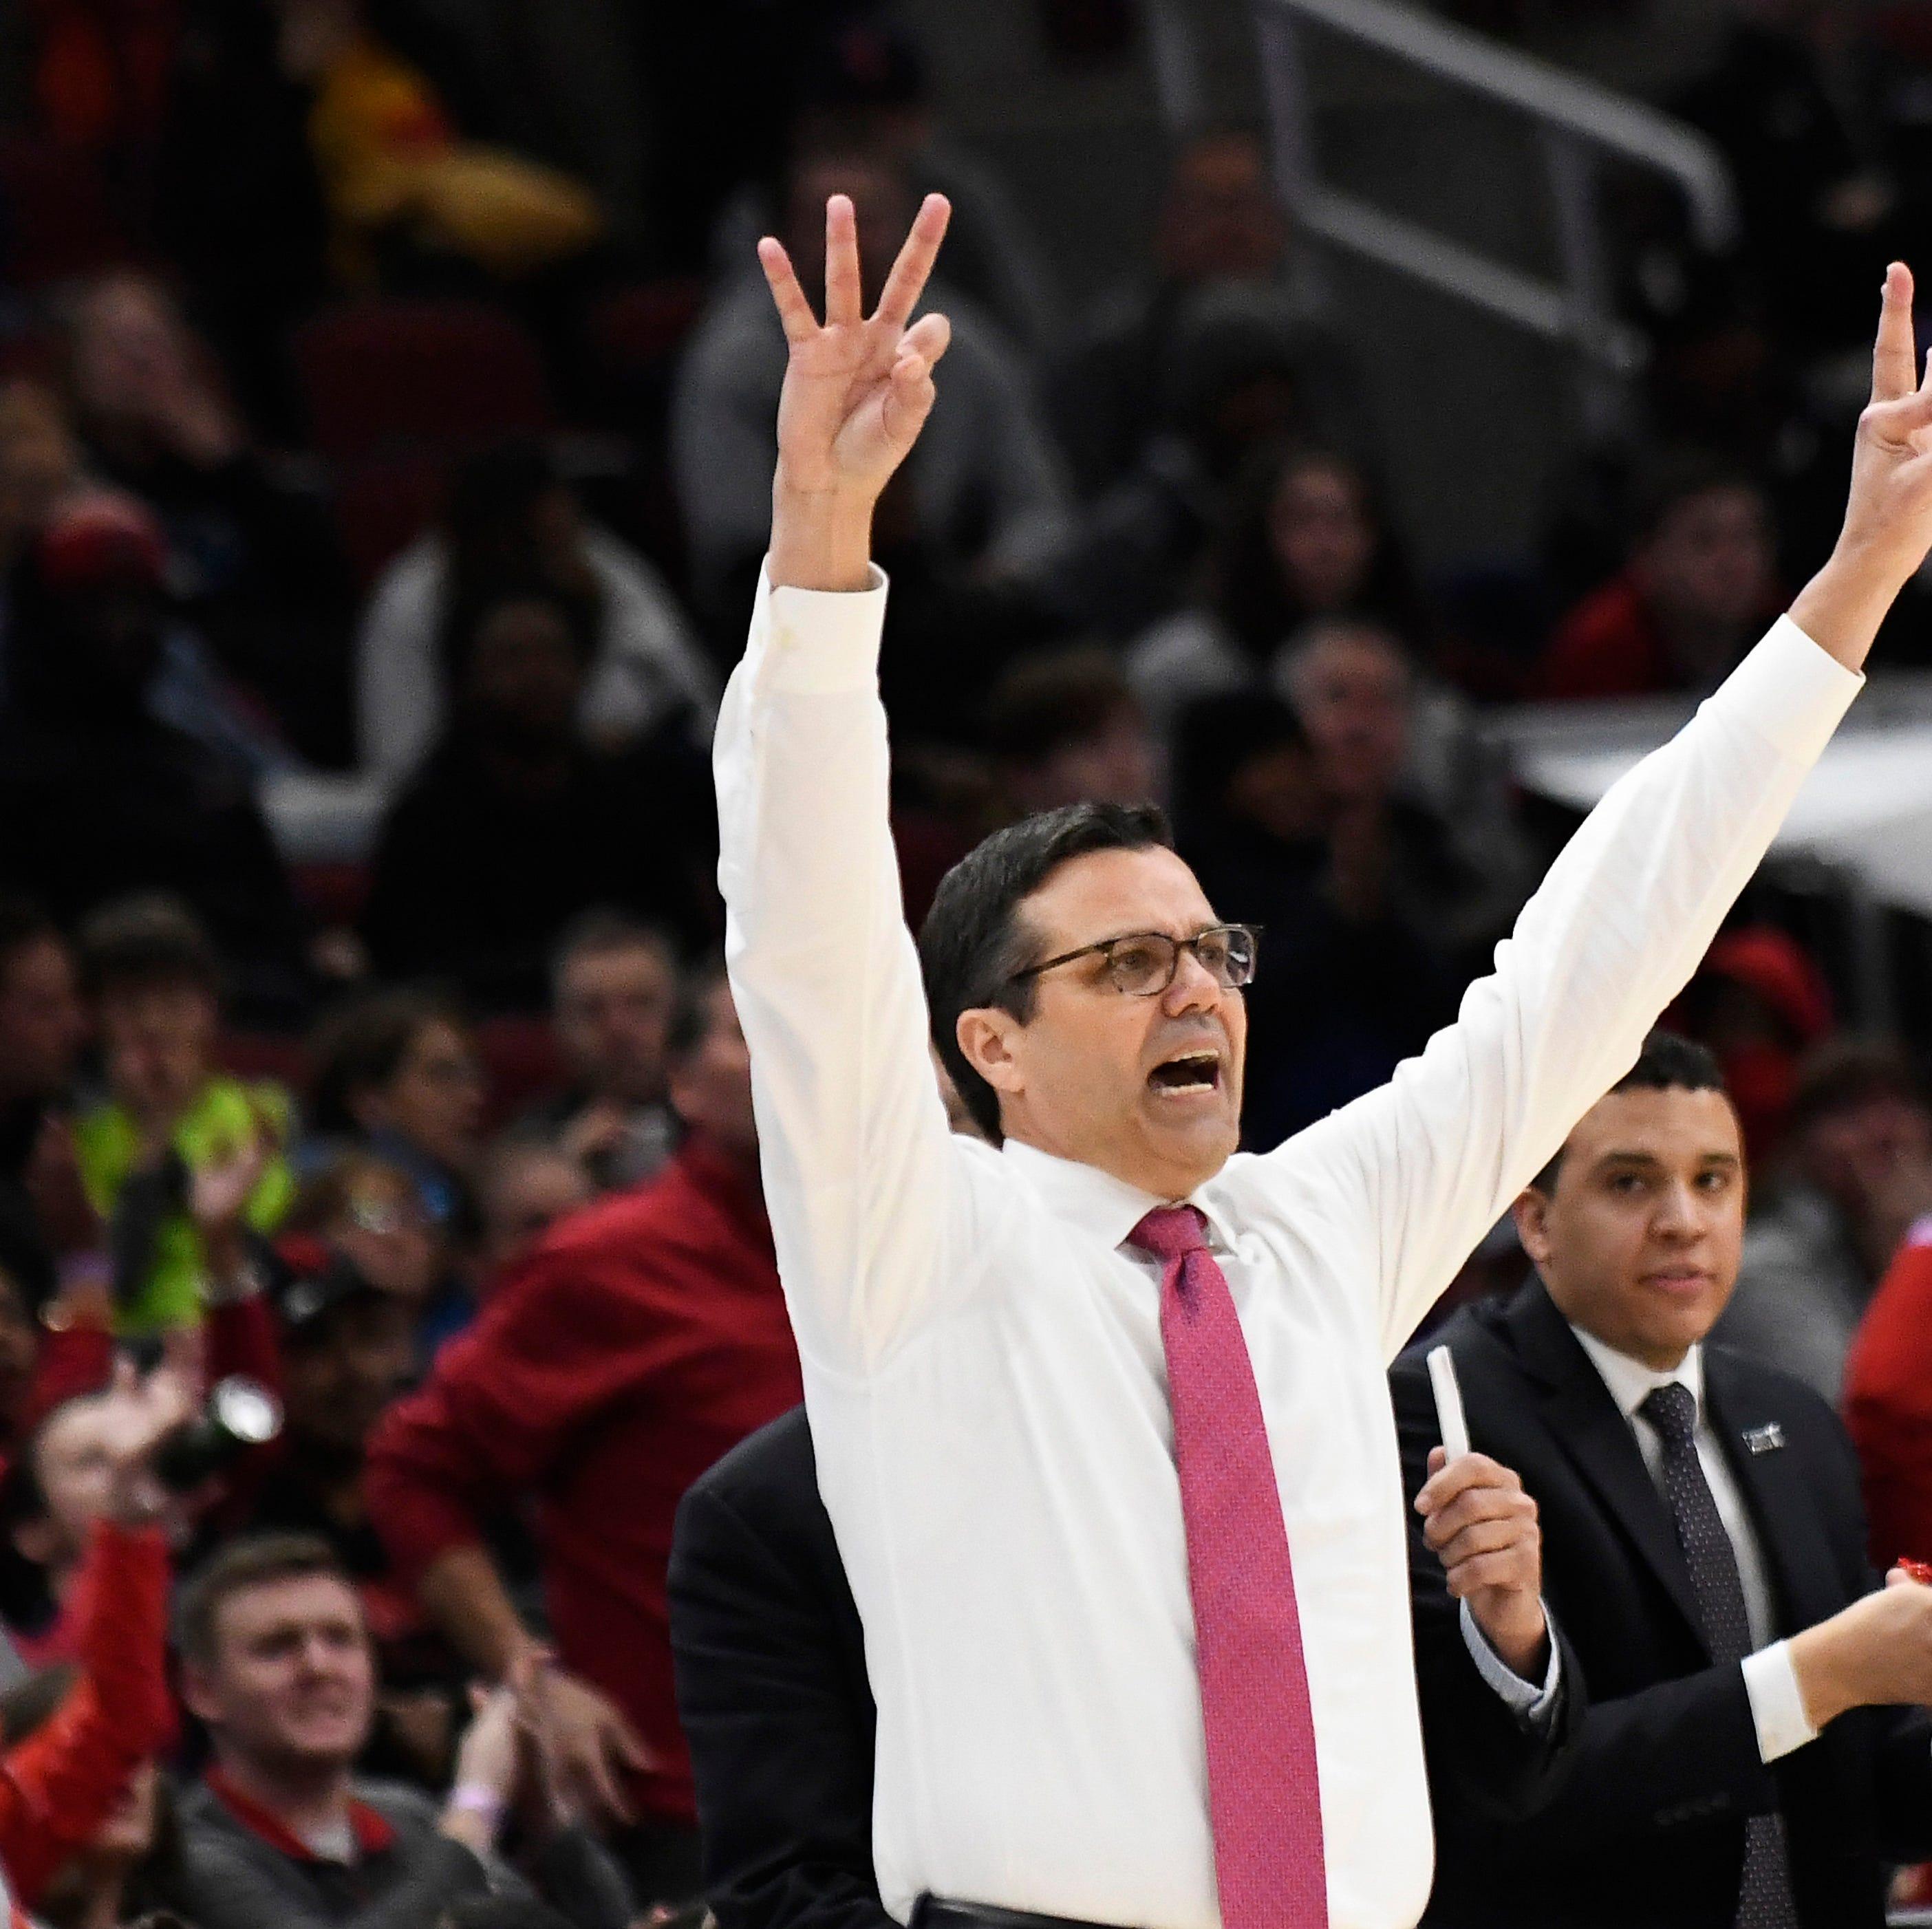 Nebraska fires former CSU basketball coach Tim Miles